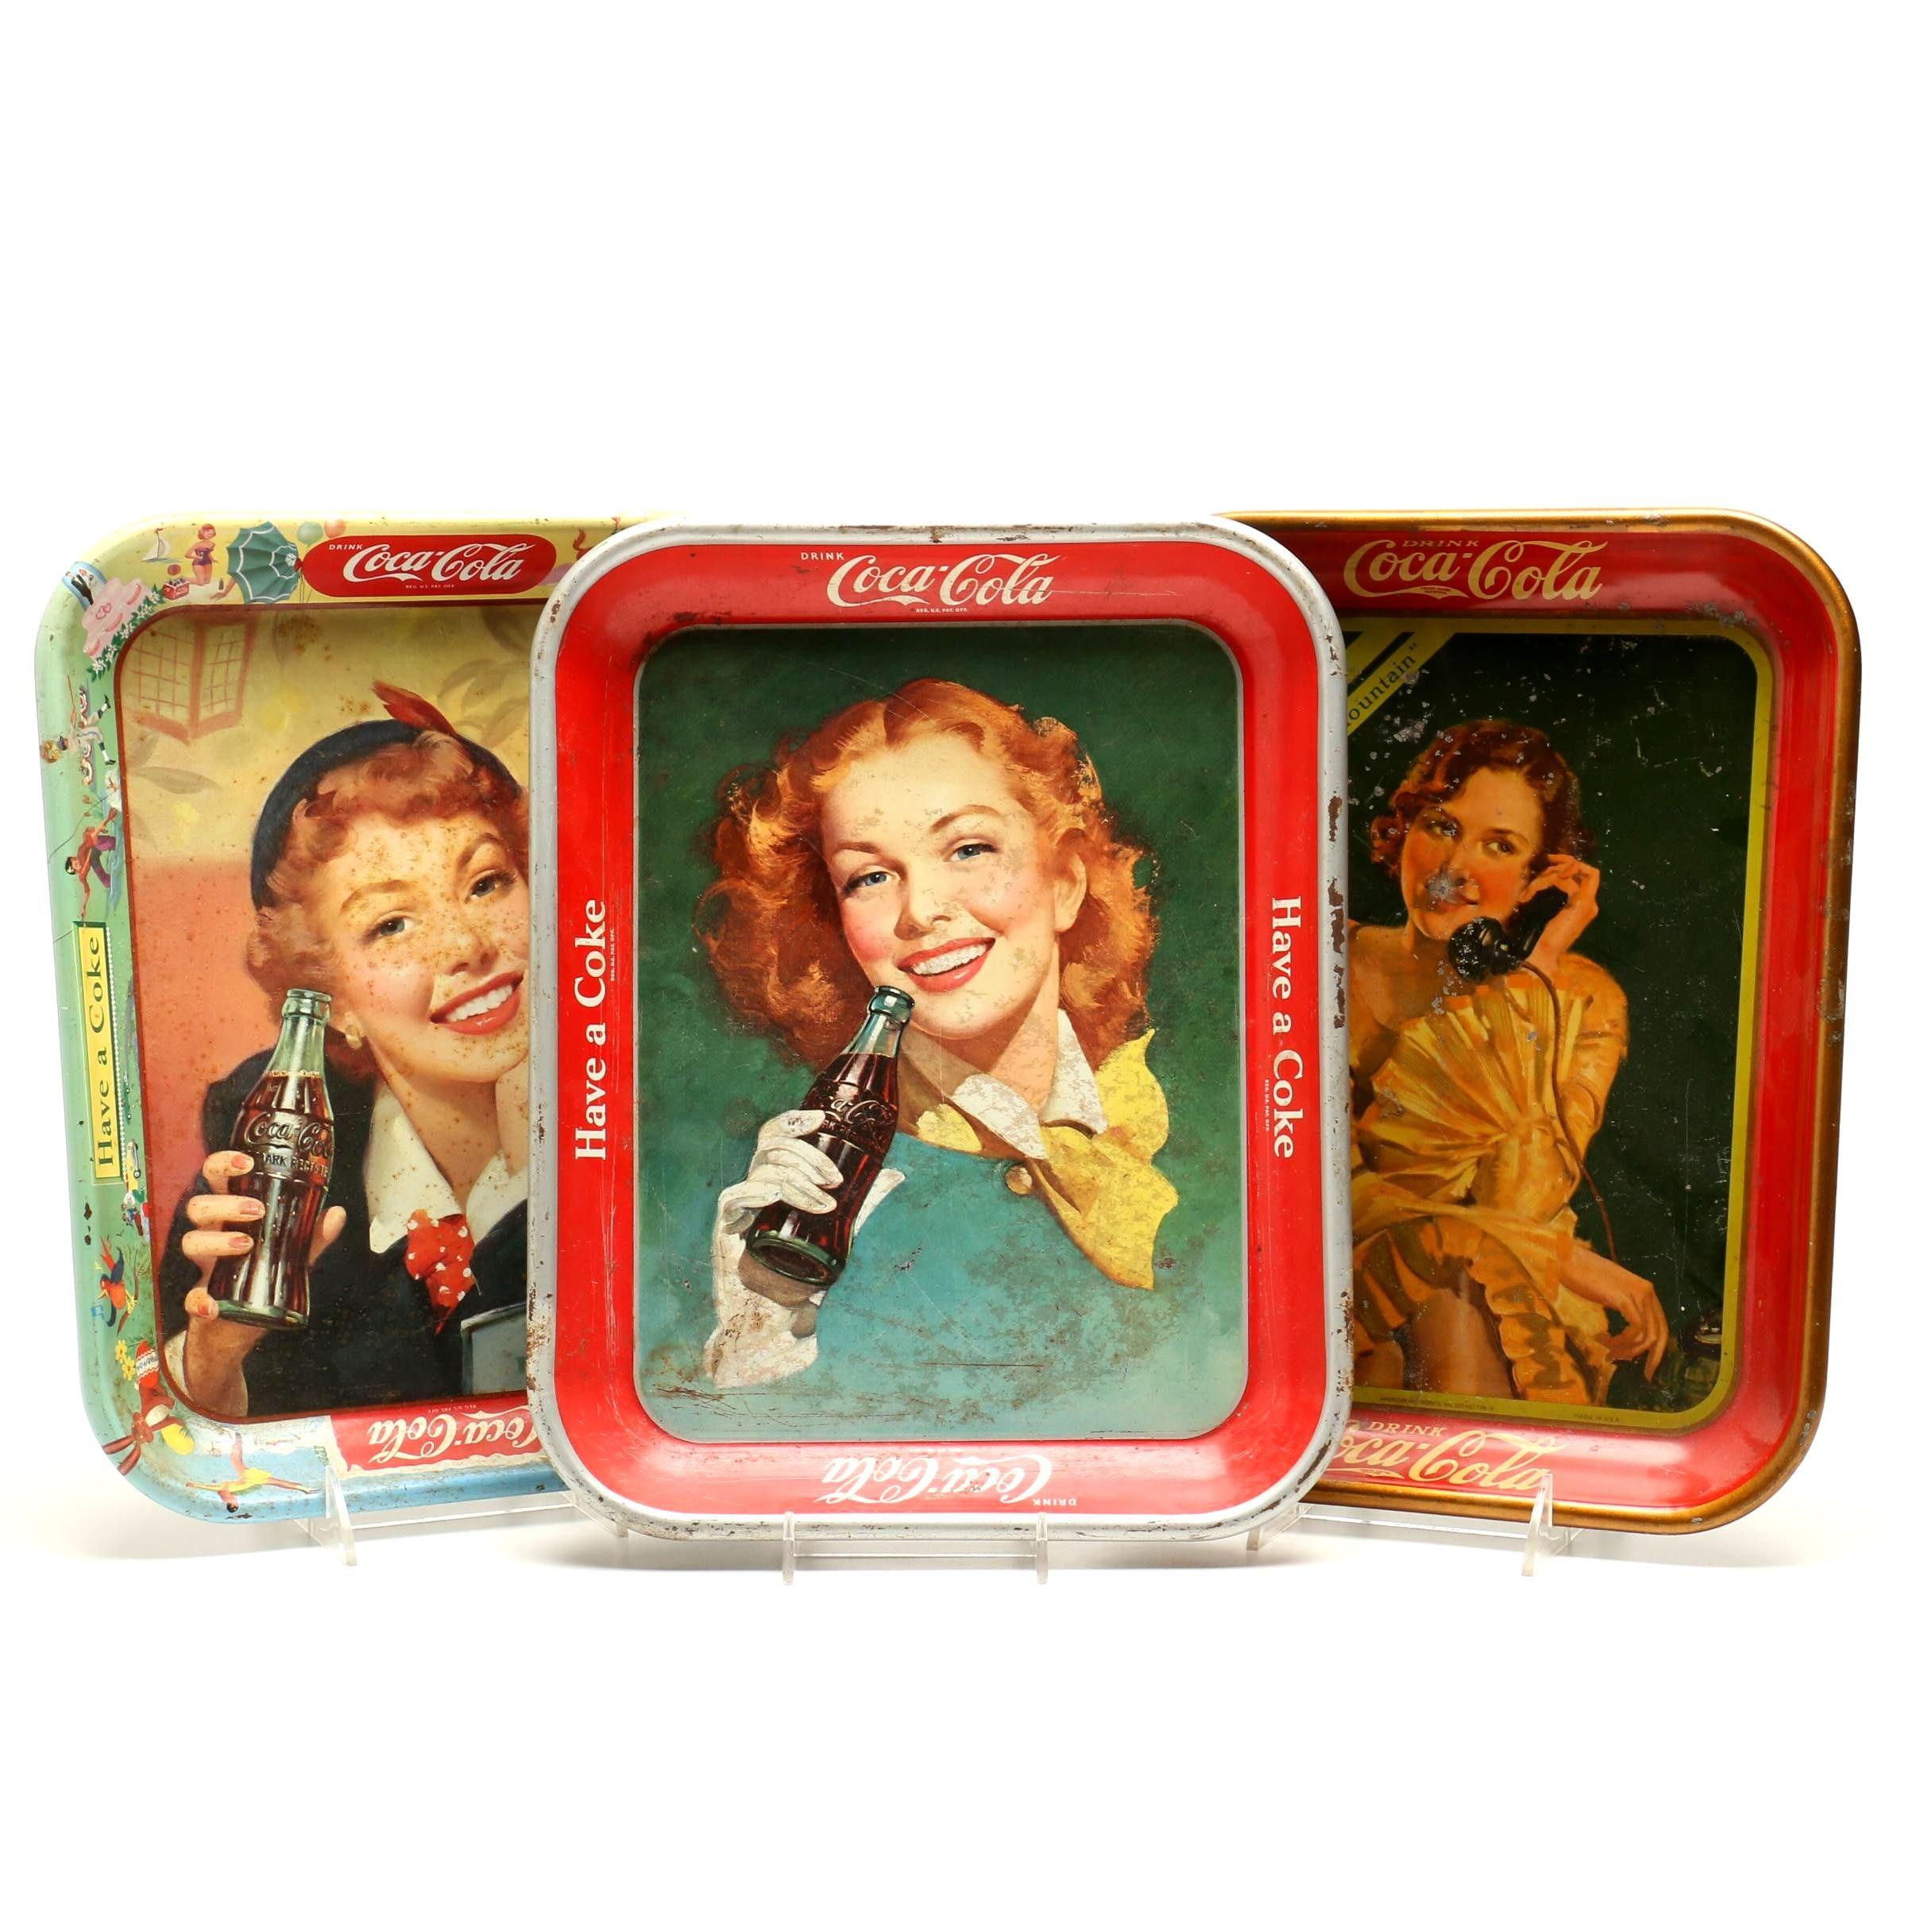 Vintage Metal Coca-Cola Advertising Trays